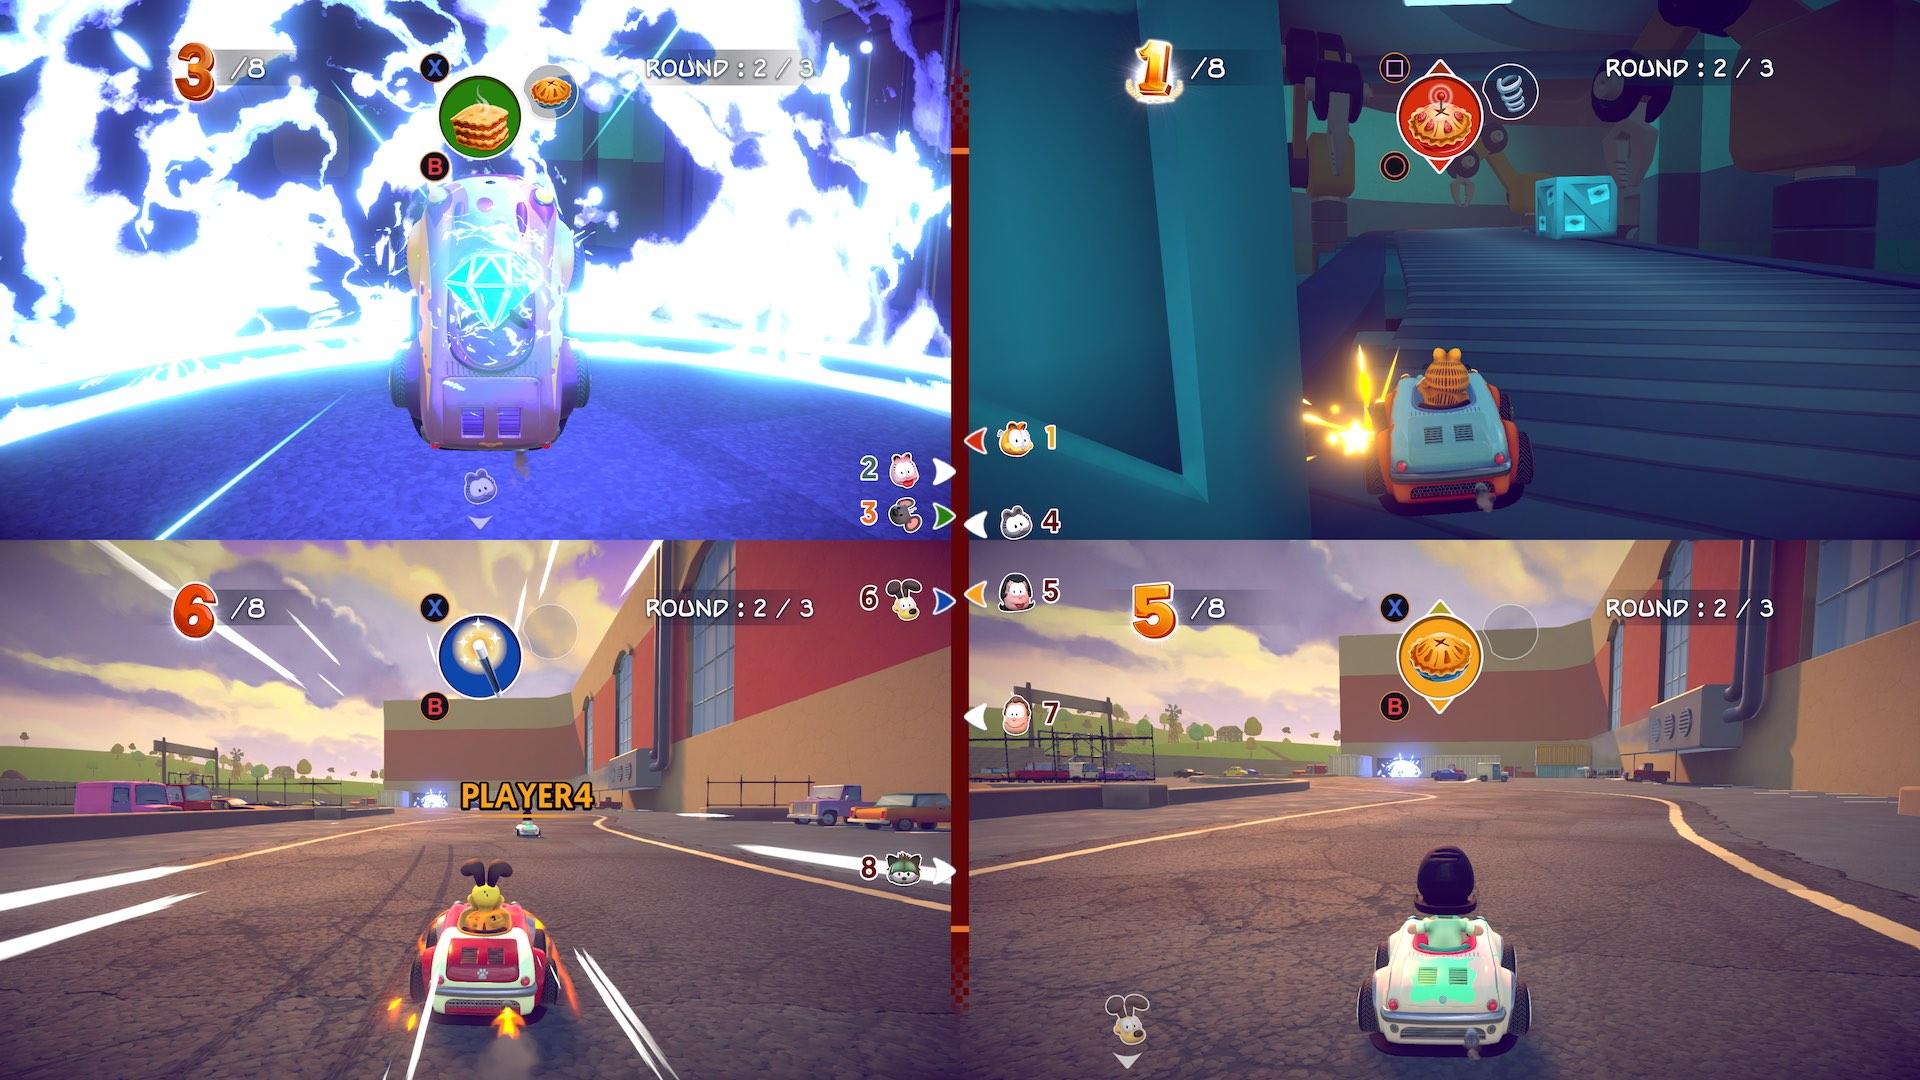 Garfield Kart Furious Racing Screenshot September 2019 10